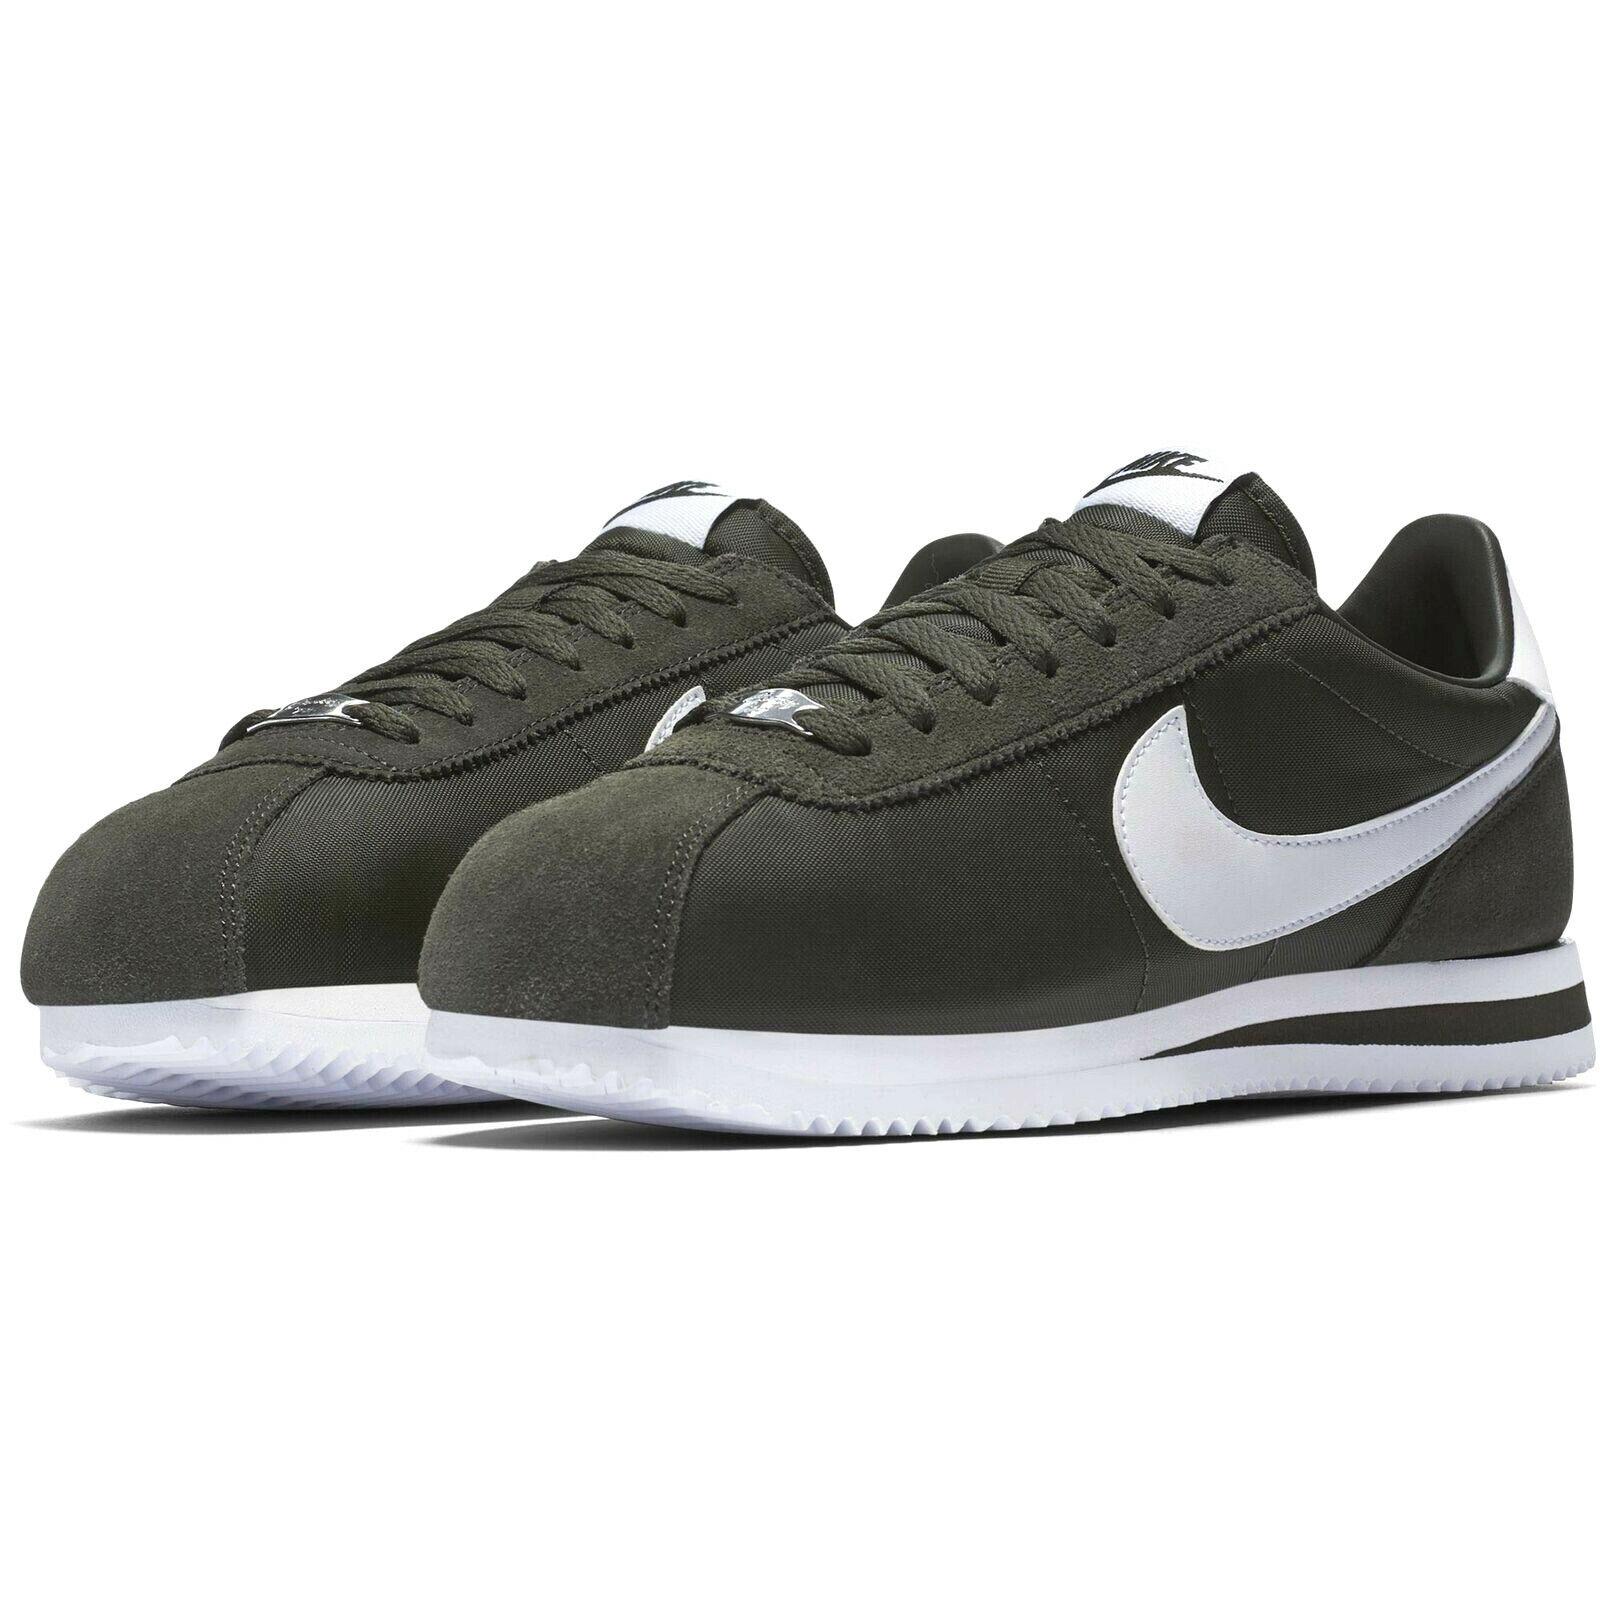 4a48afbf0e21 Nike Cortez Classic Basic Nylon SEQUOIA OLIVE OLIVE OLIVE DARK GREEN WHITE  819720-301 0a2ac8